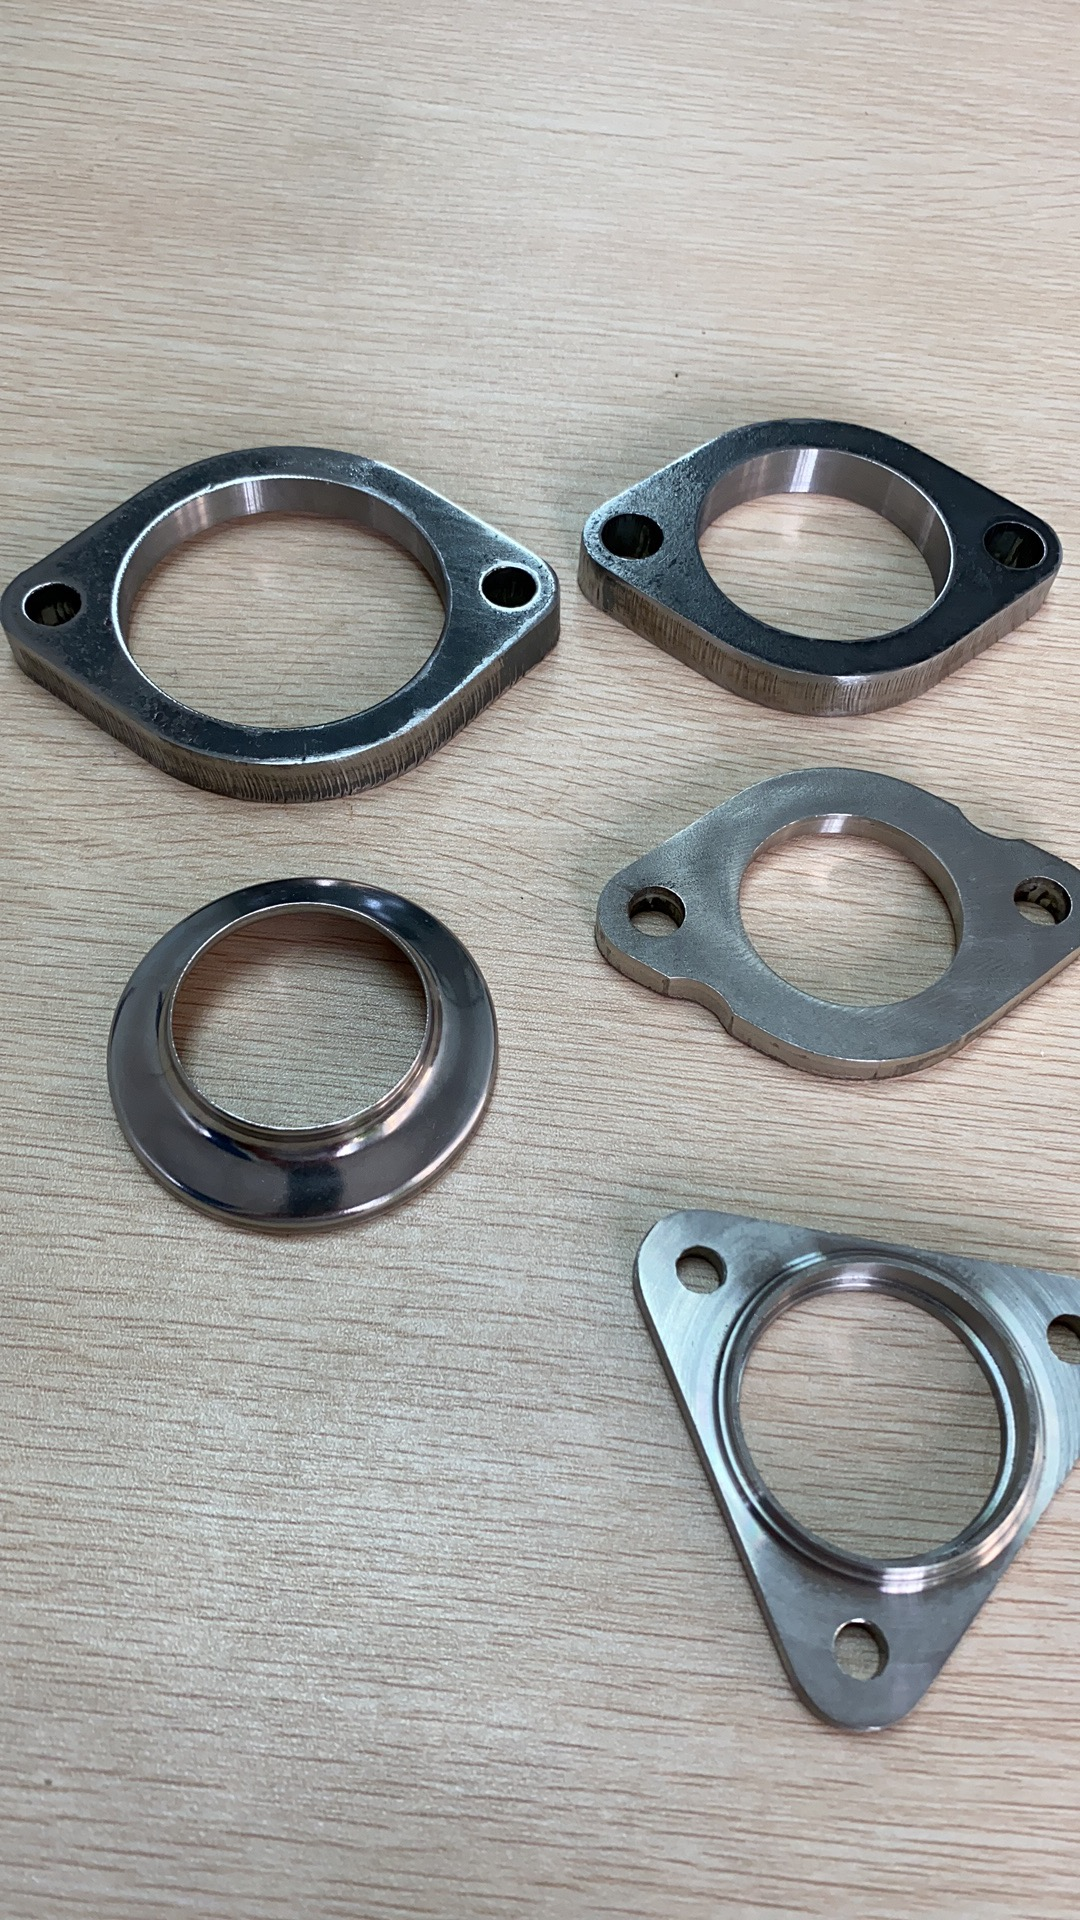 Car Exhaust System / Flange / Bracket / Muffler Parts / Catalytic Converter Parts / Bellows